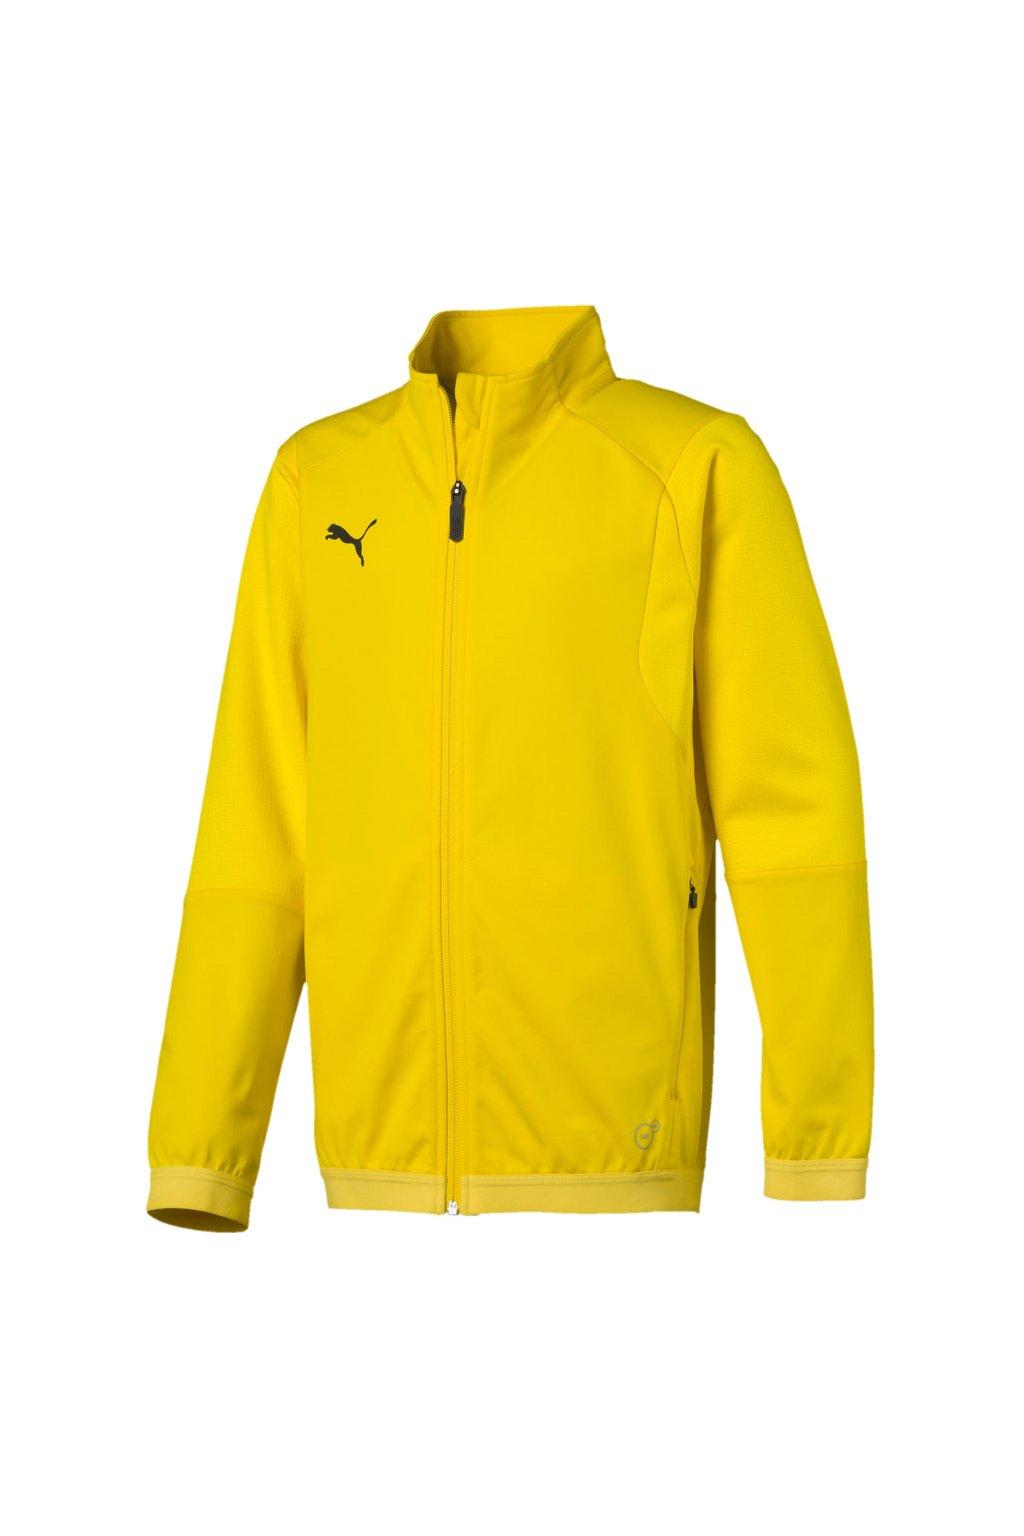 Detská mikina Puma Liga Training Jacket JUNIOR žltá 655688 07